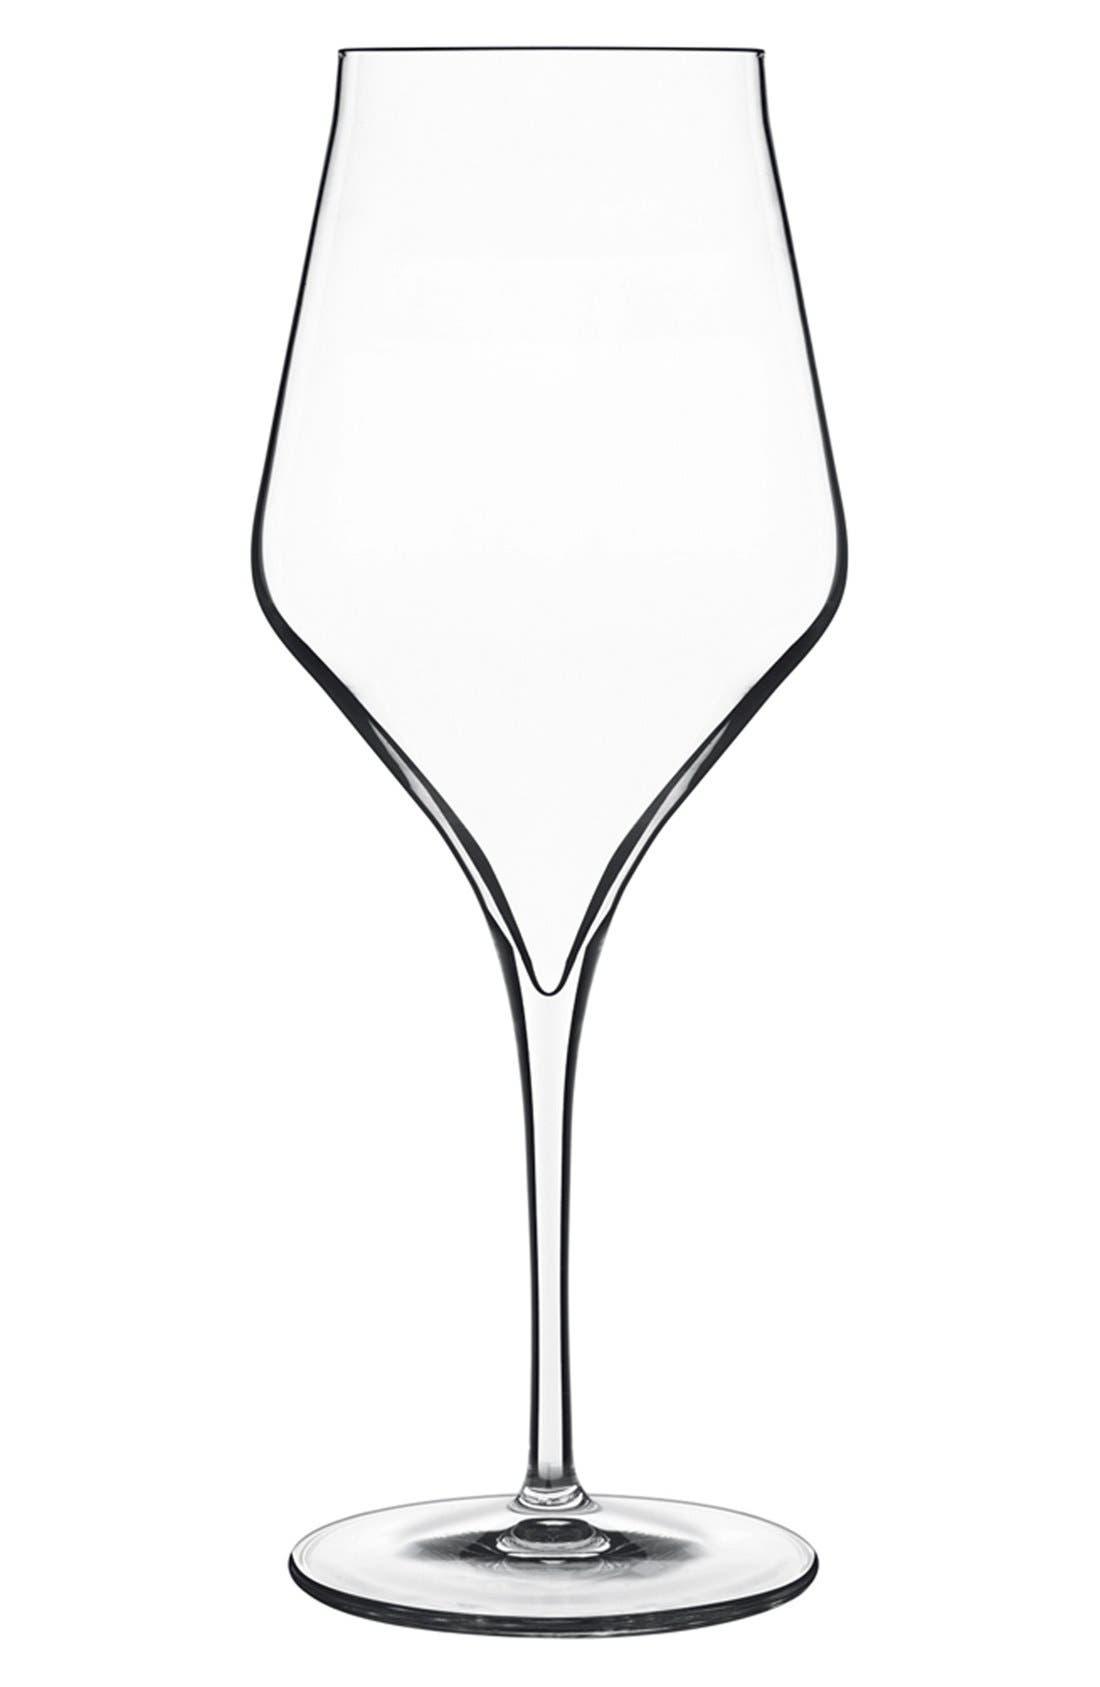 Alternate Image 1 Selected - Luigi Bormioli 'Supremo' Bordeaux Wine Glasses (Set of 6)